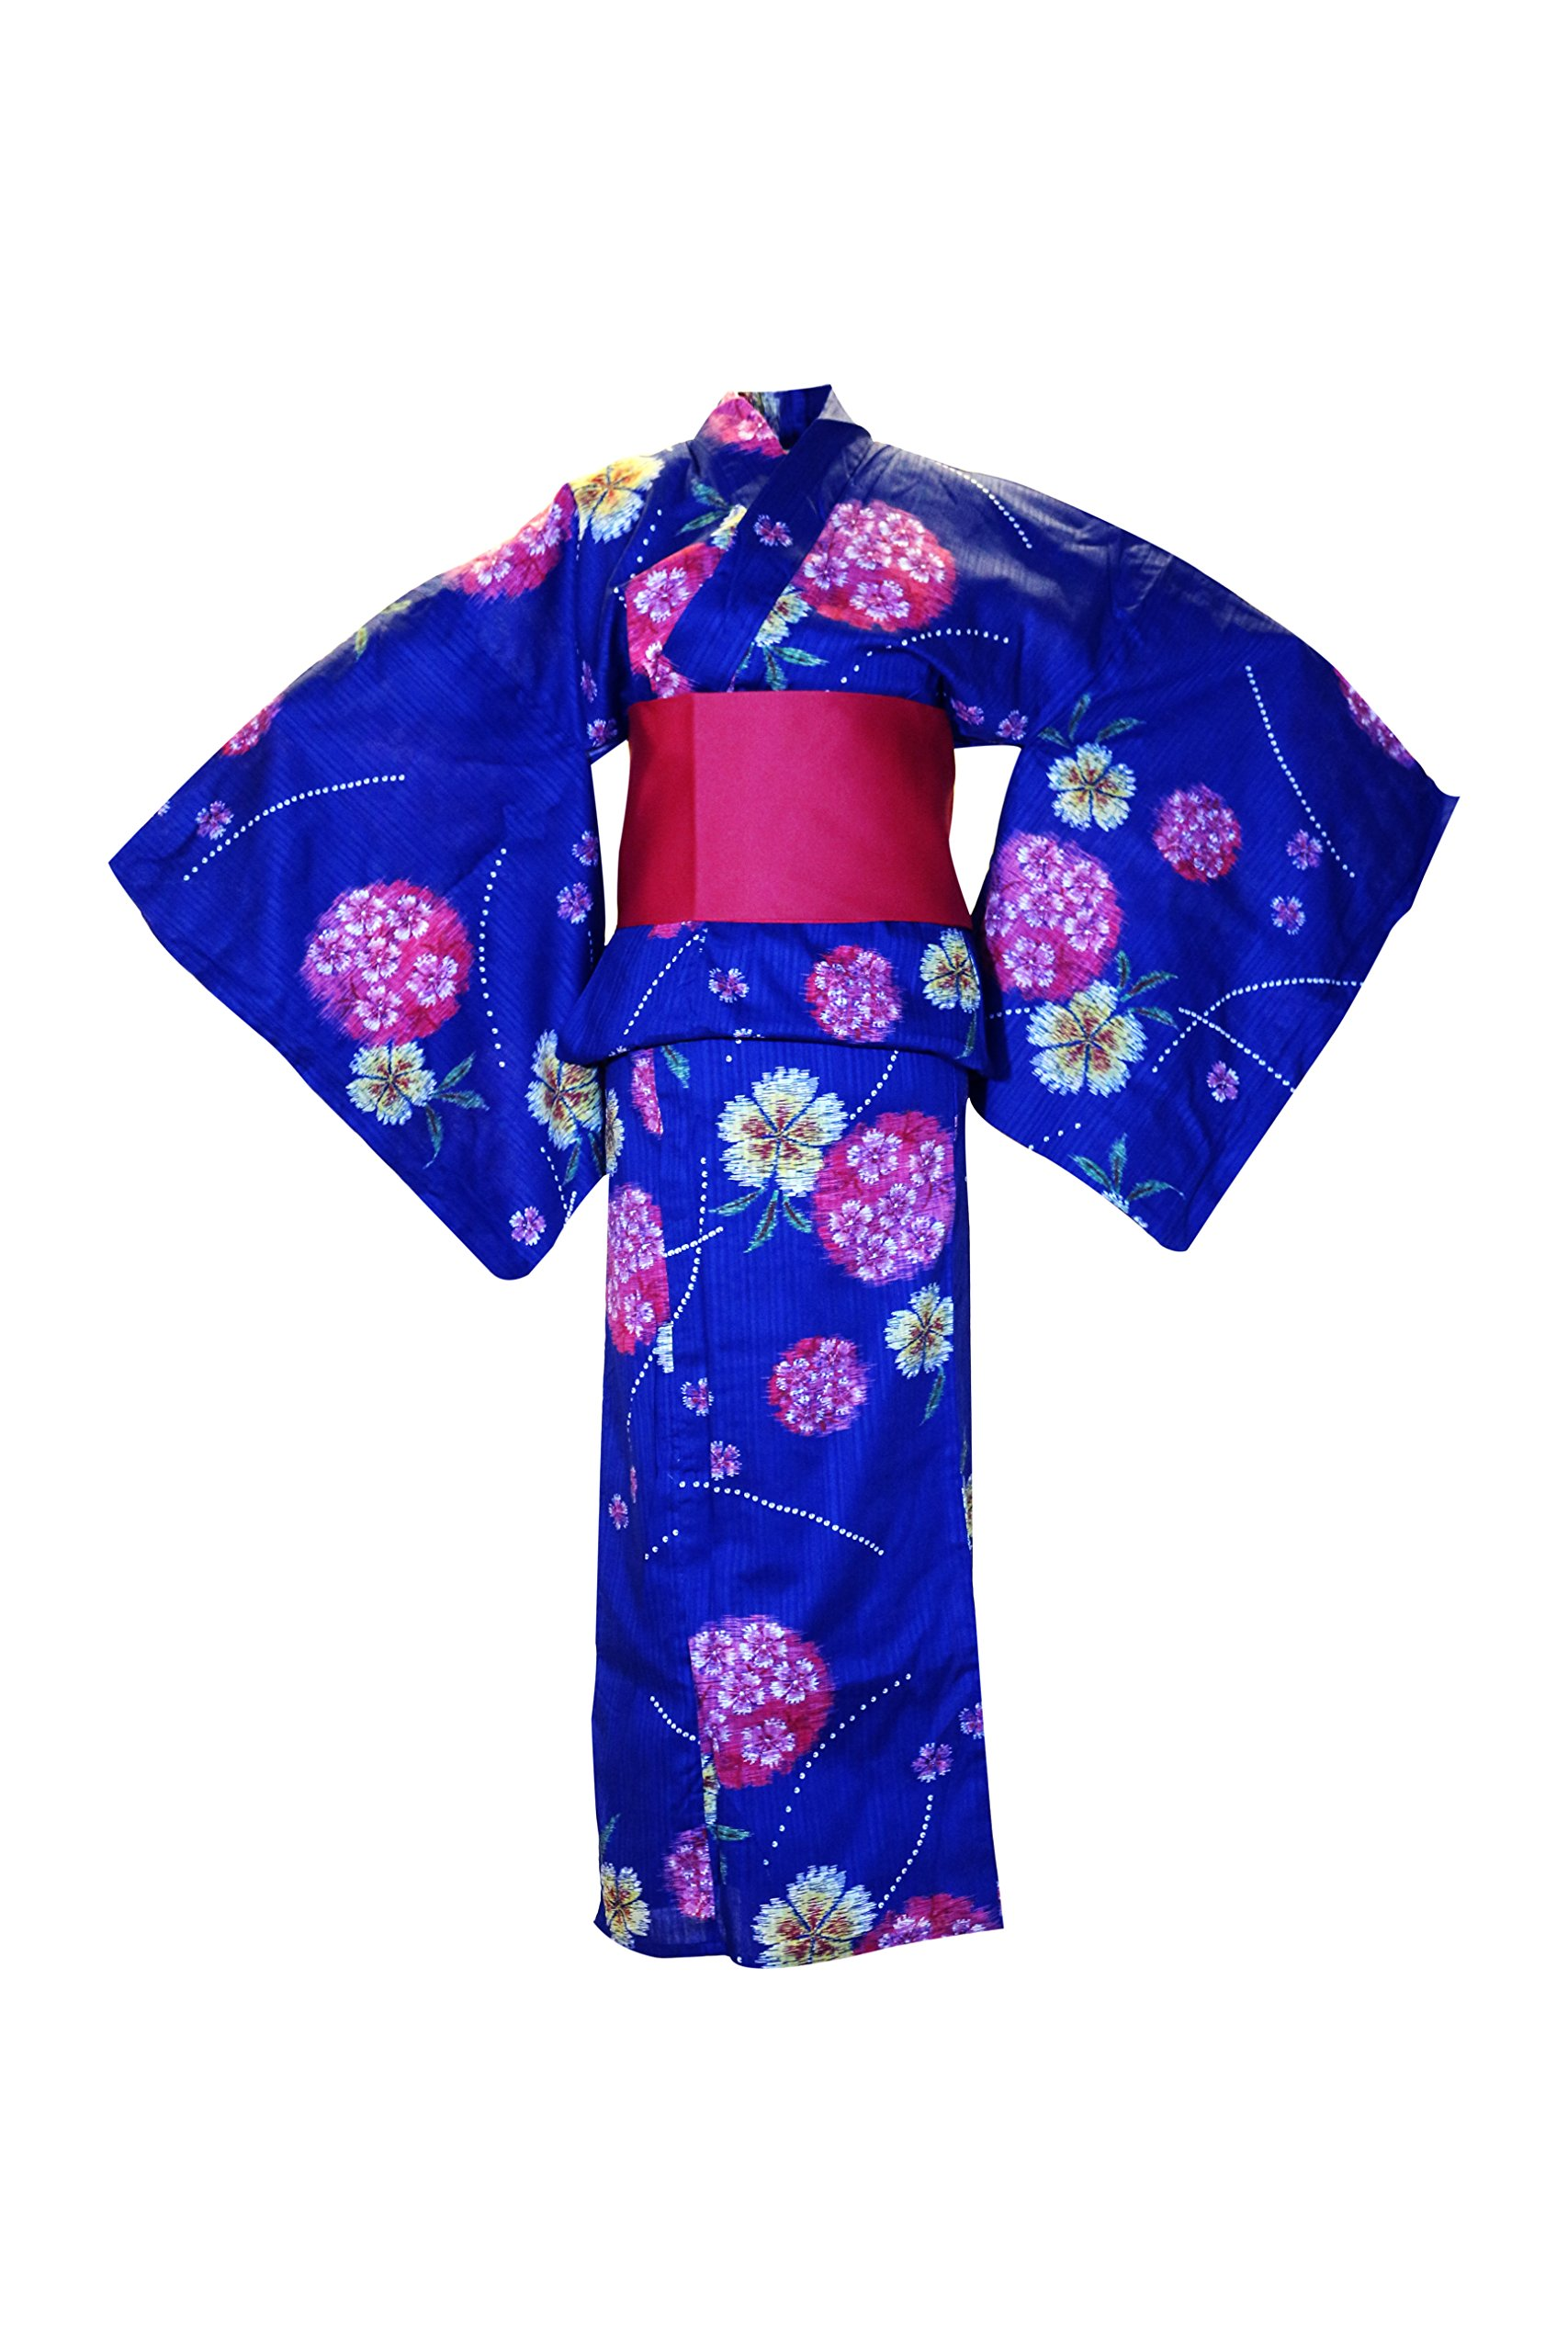 myKimono Women's Traditional Japanese Kimono Robe Yukata 505 with Red OBI Belt / Blue with Flower Pattern